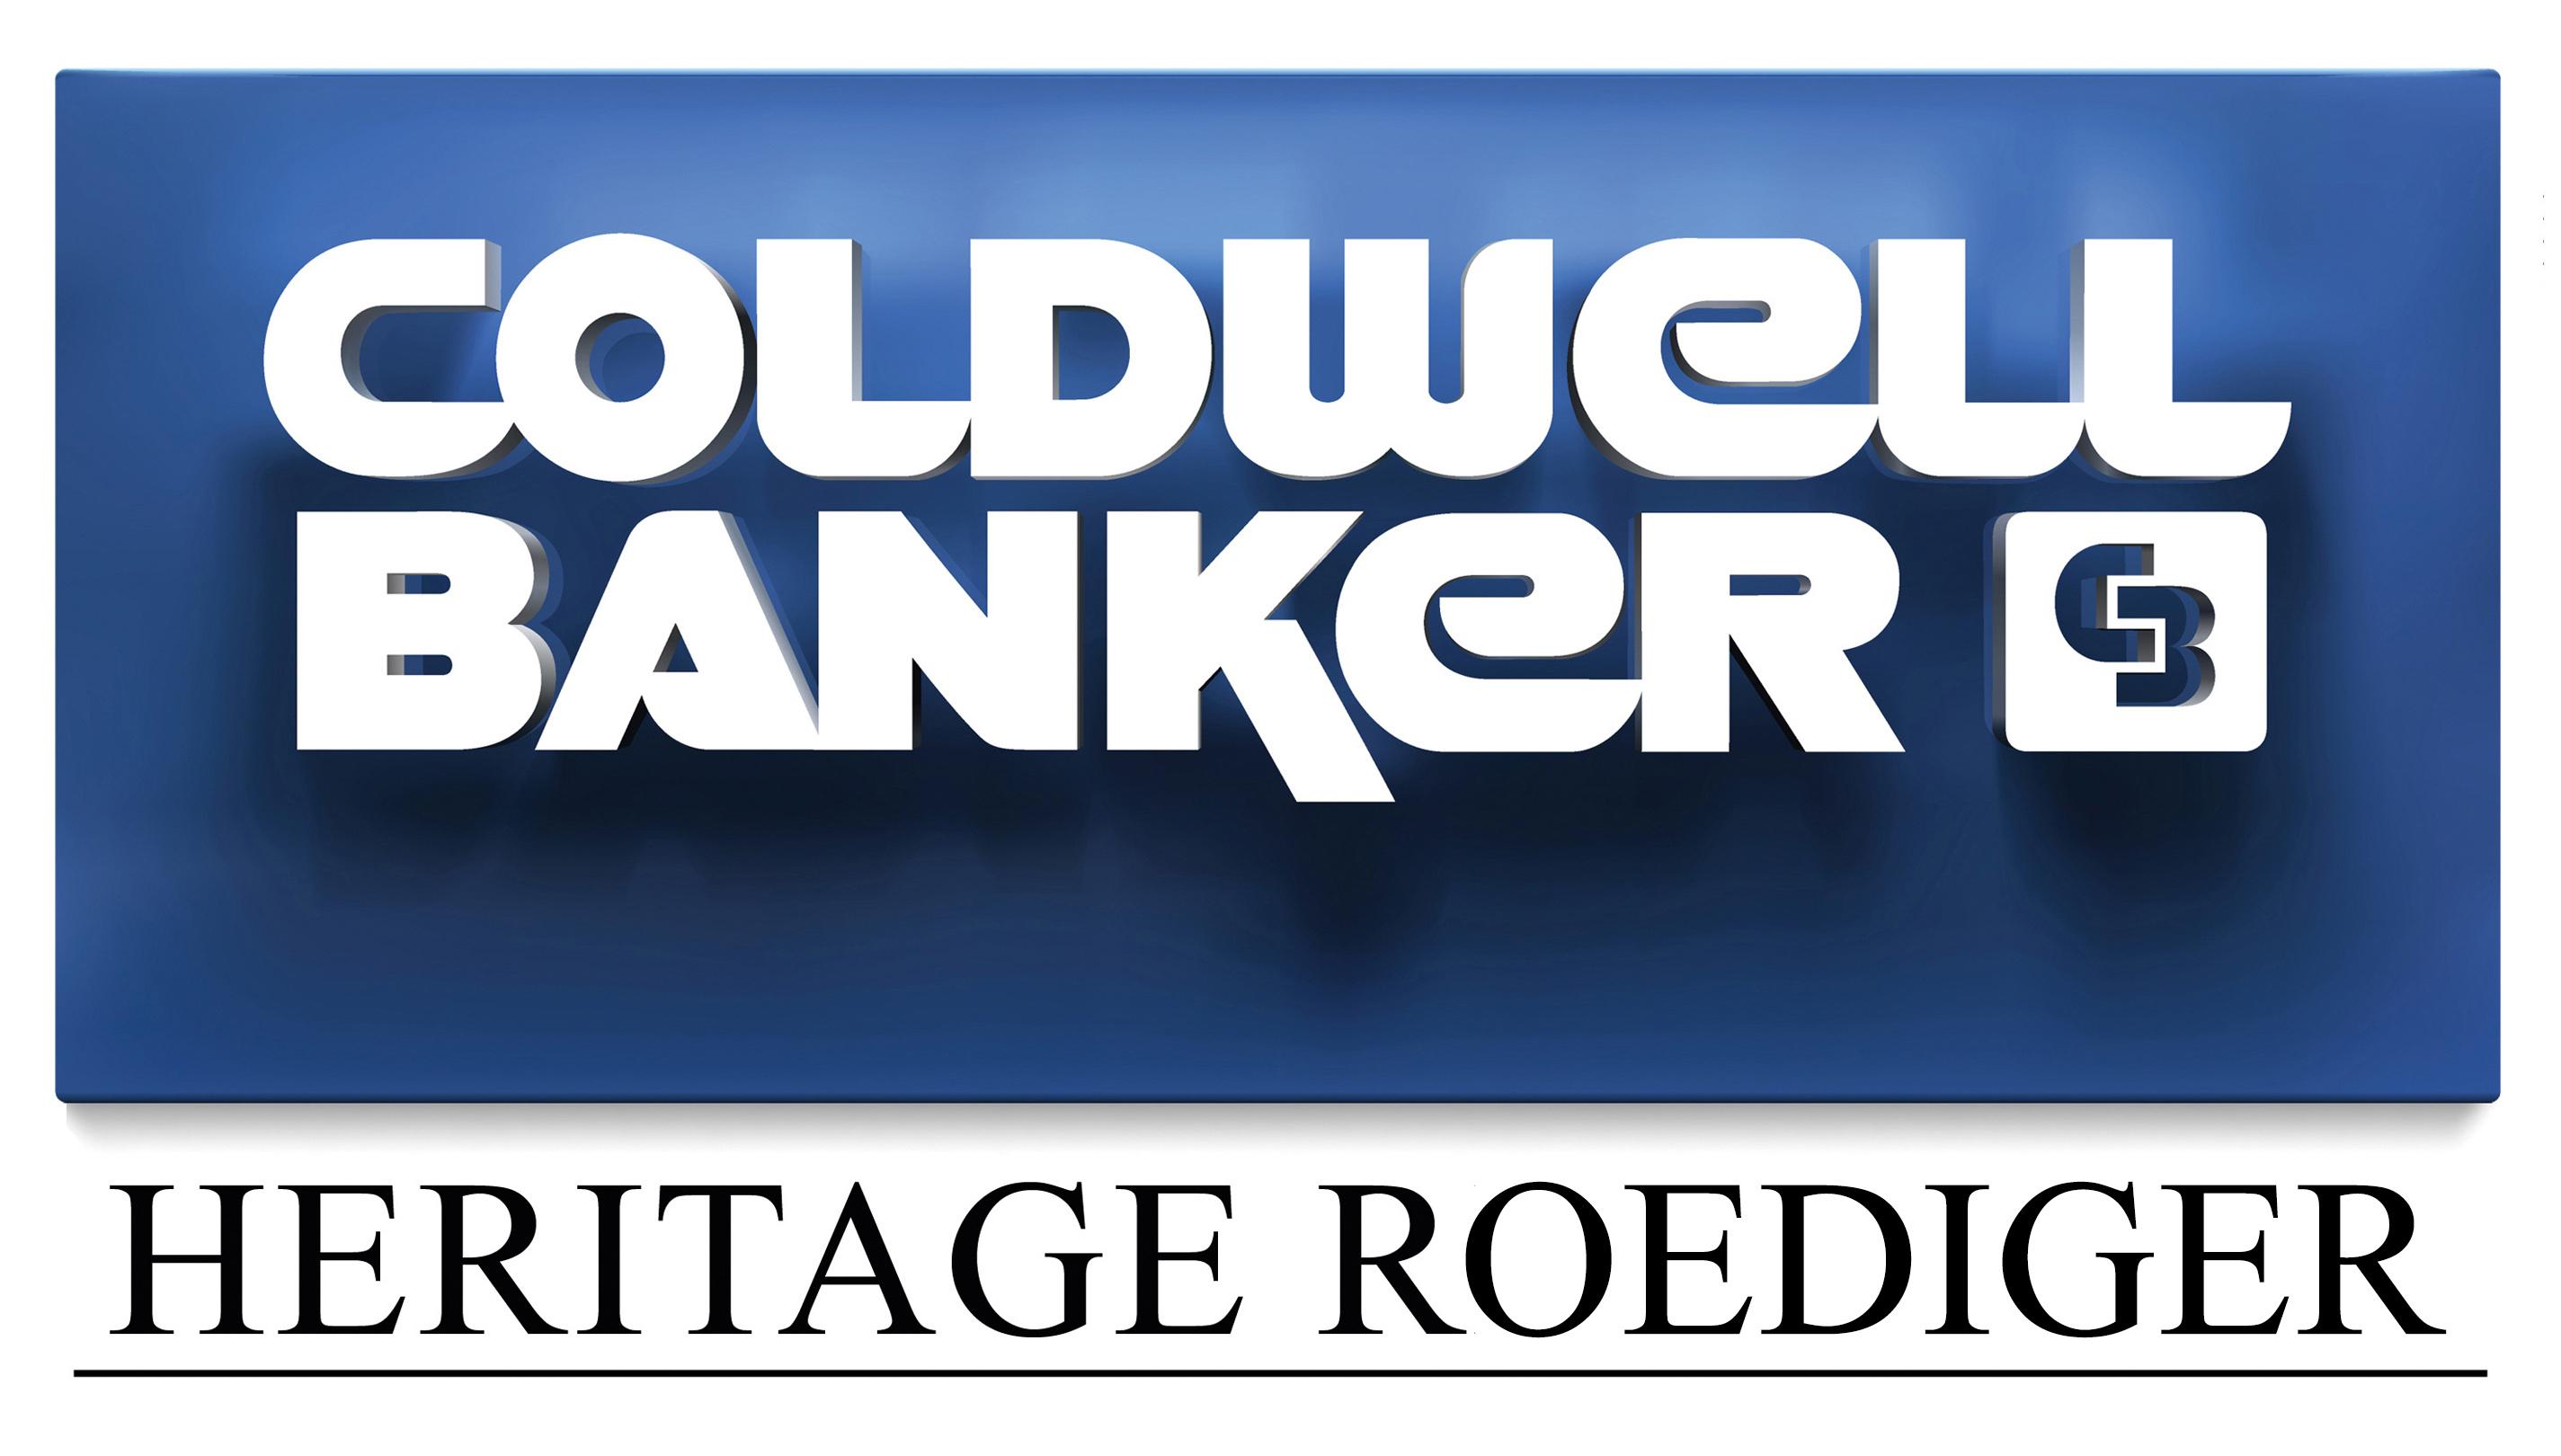 Caldwell Banker